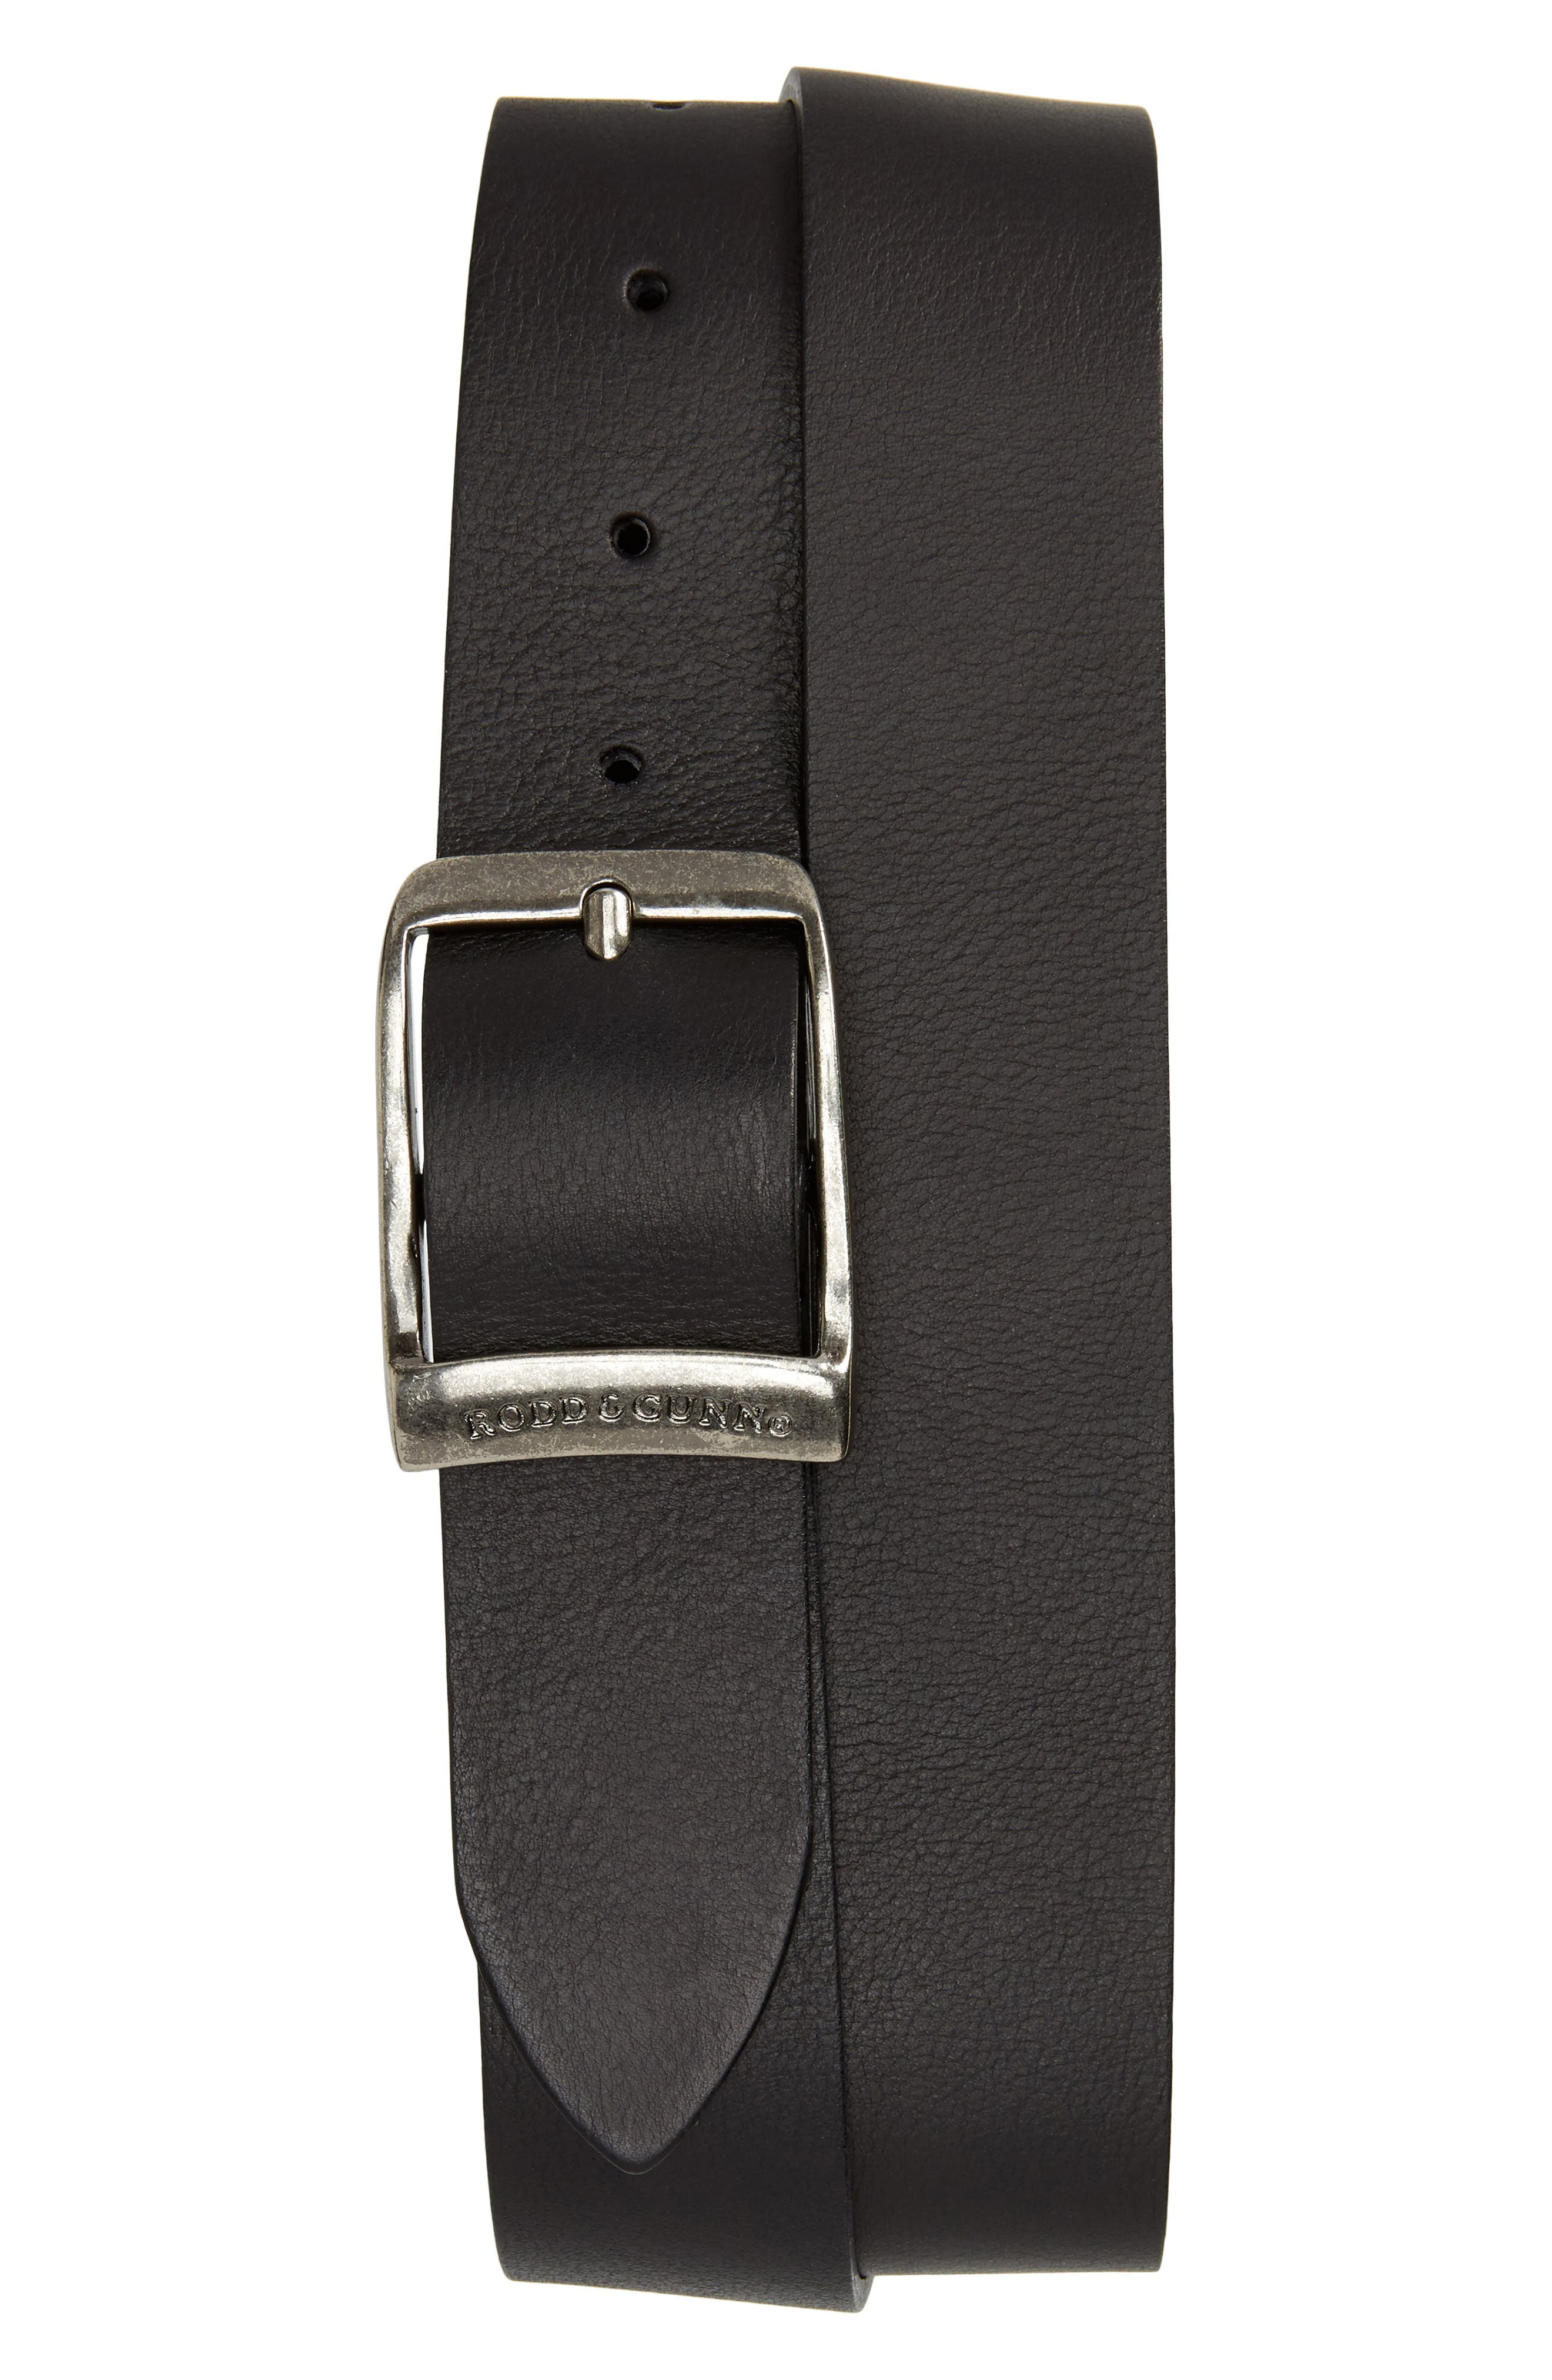 Rodd & Gunn Cornonet Crescent Leather Belt